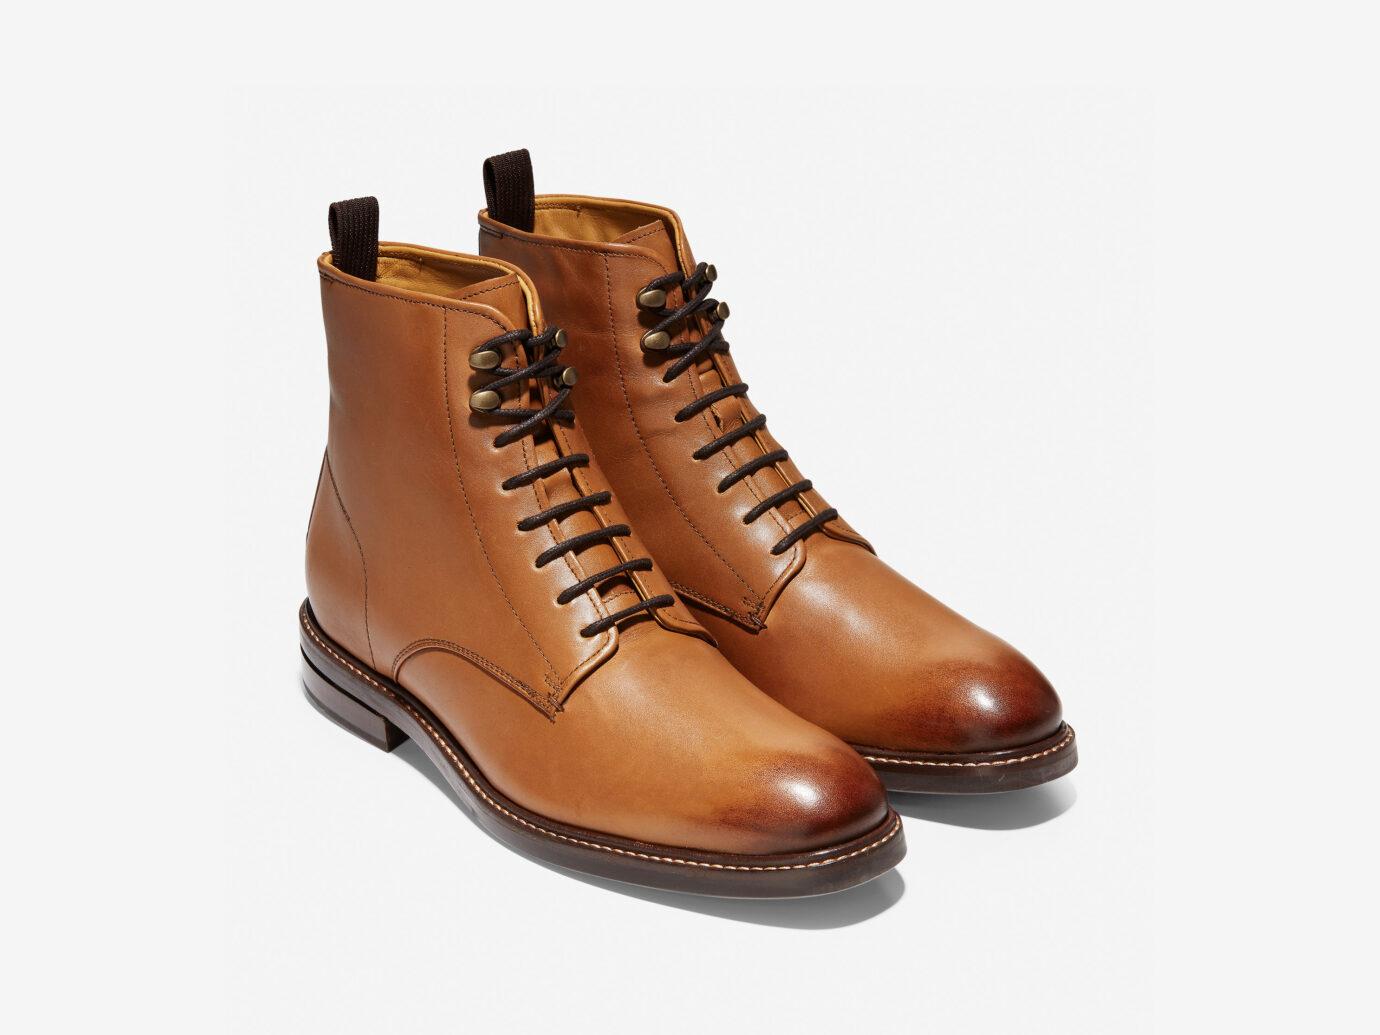 Cole Hann Wagner Grand Plain Toe Boot